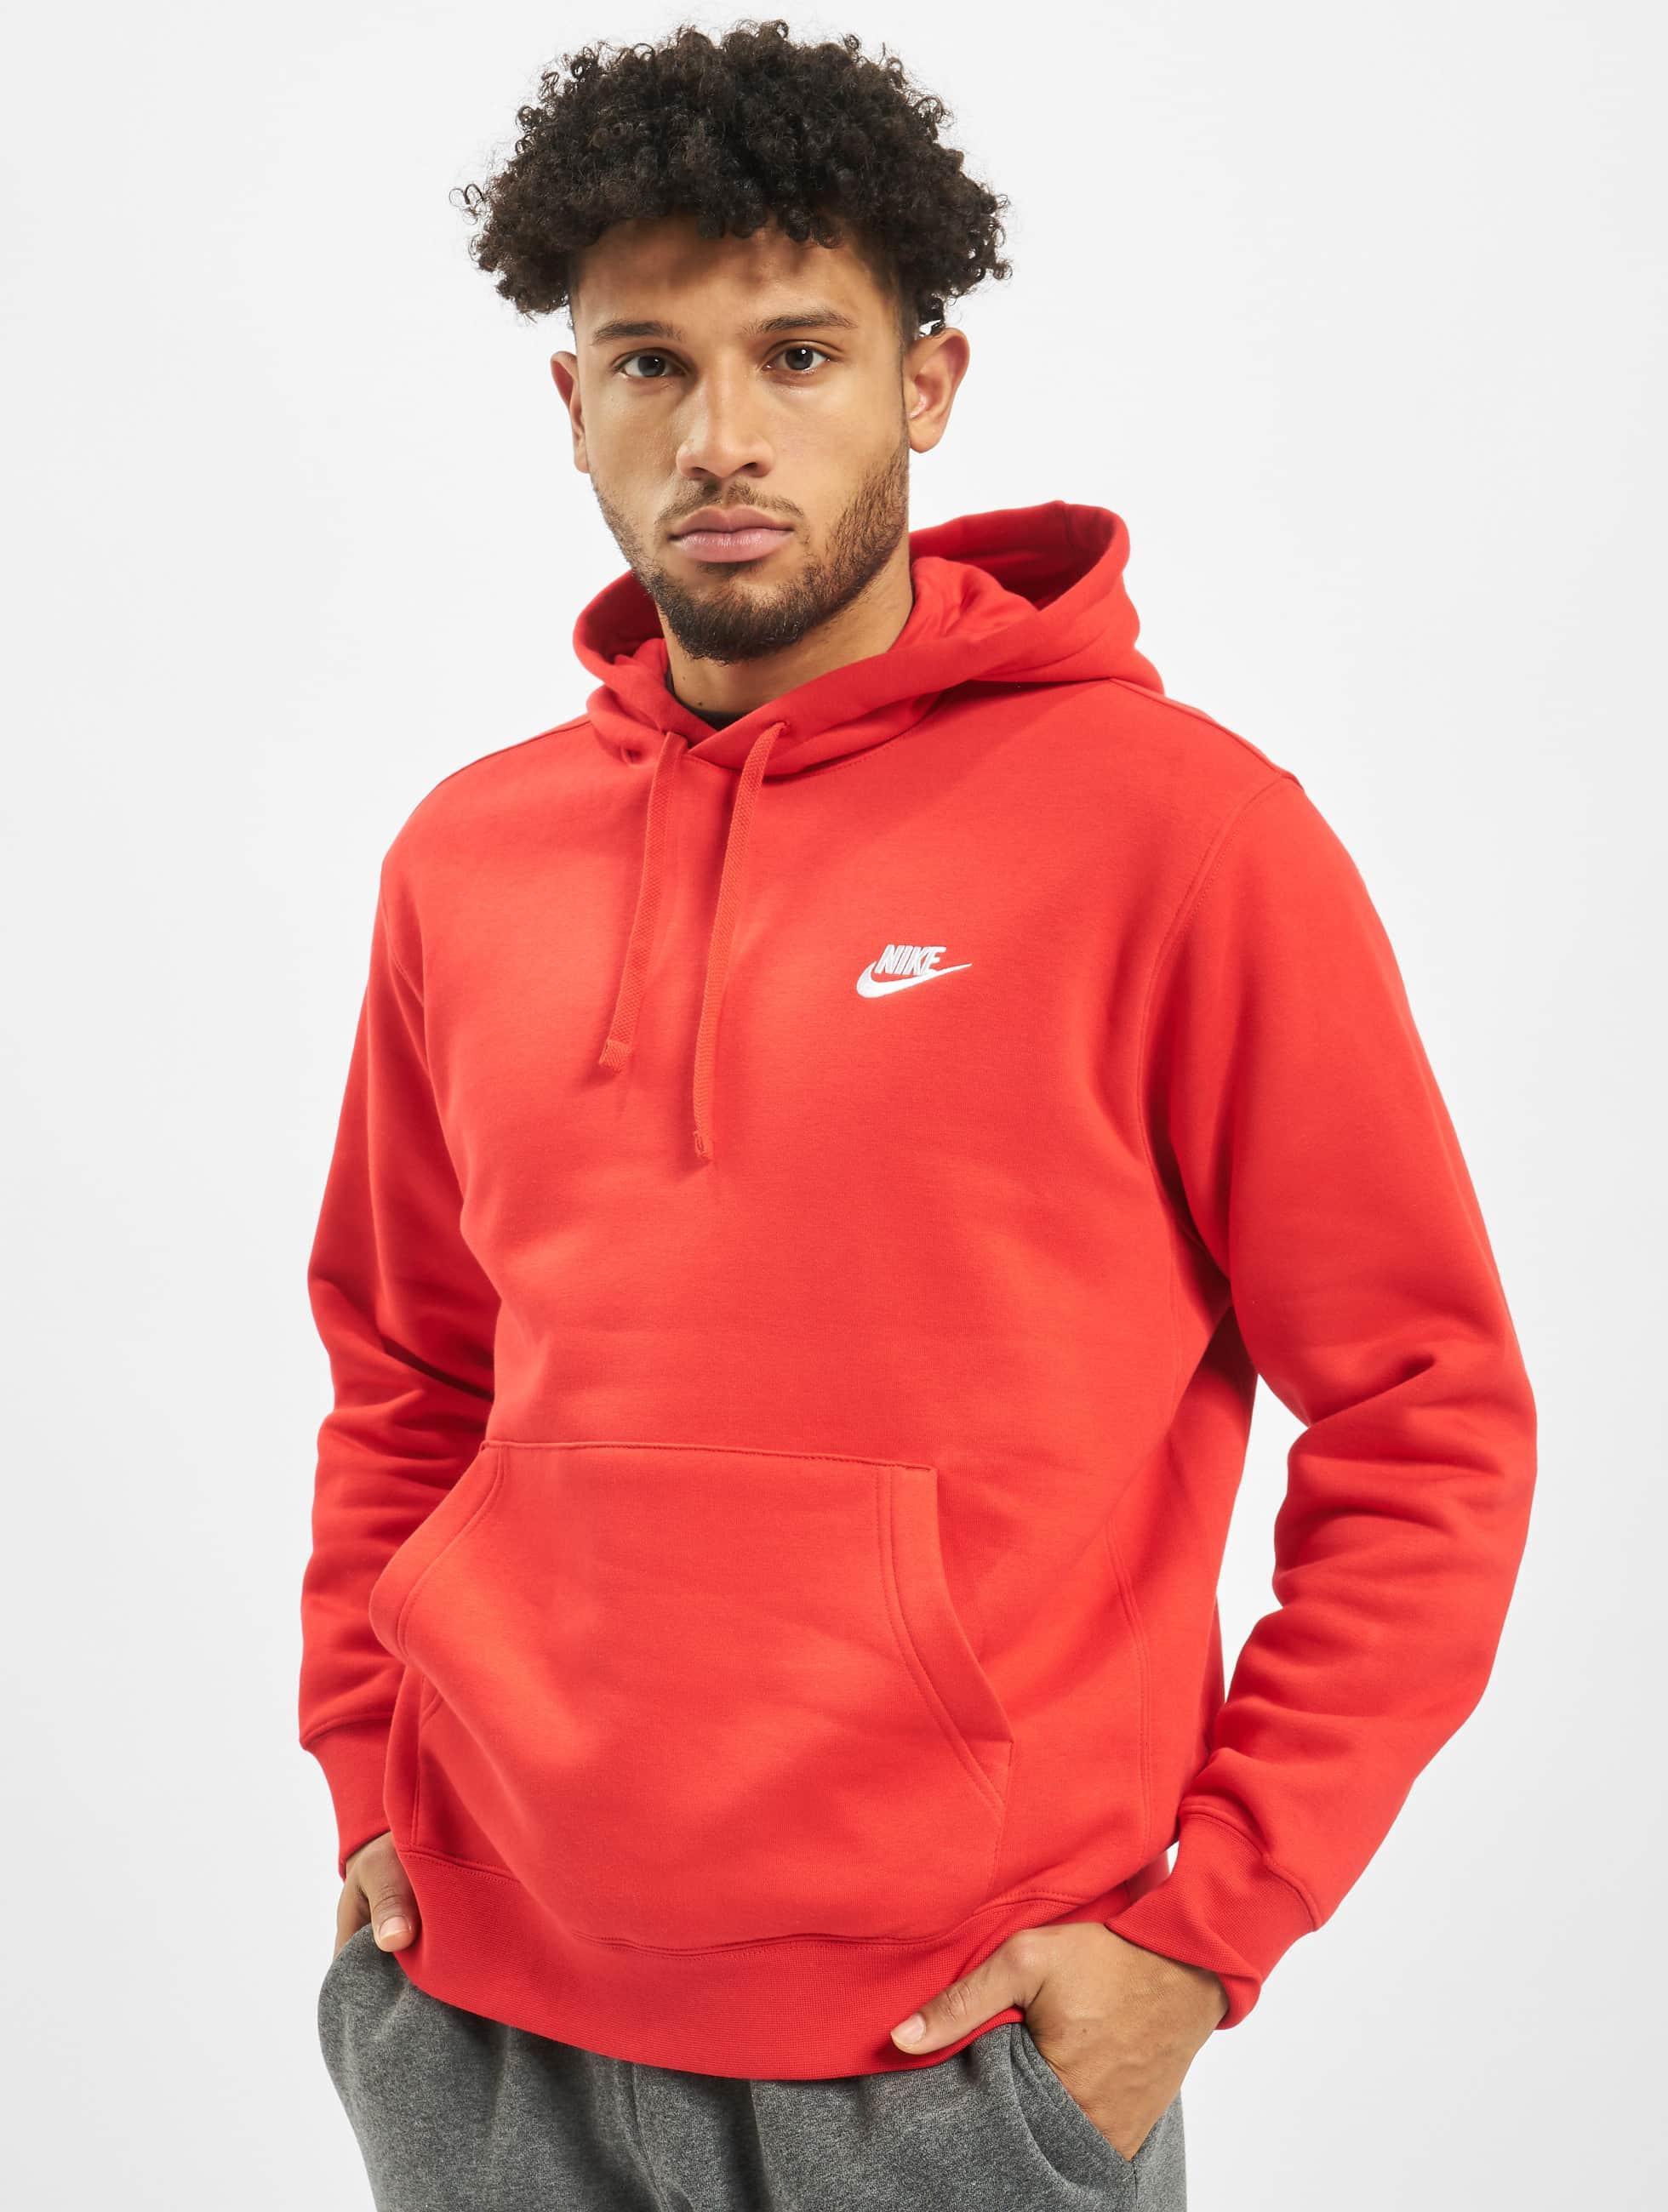 Club University RedUniversity RedWhite Nike Hoodie nwZPk80OXN